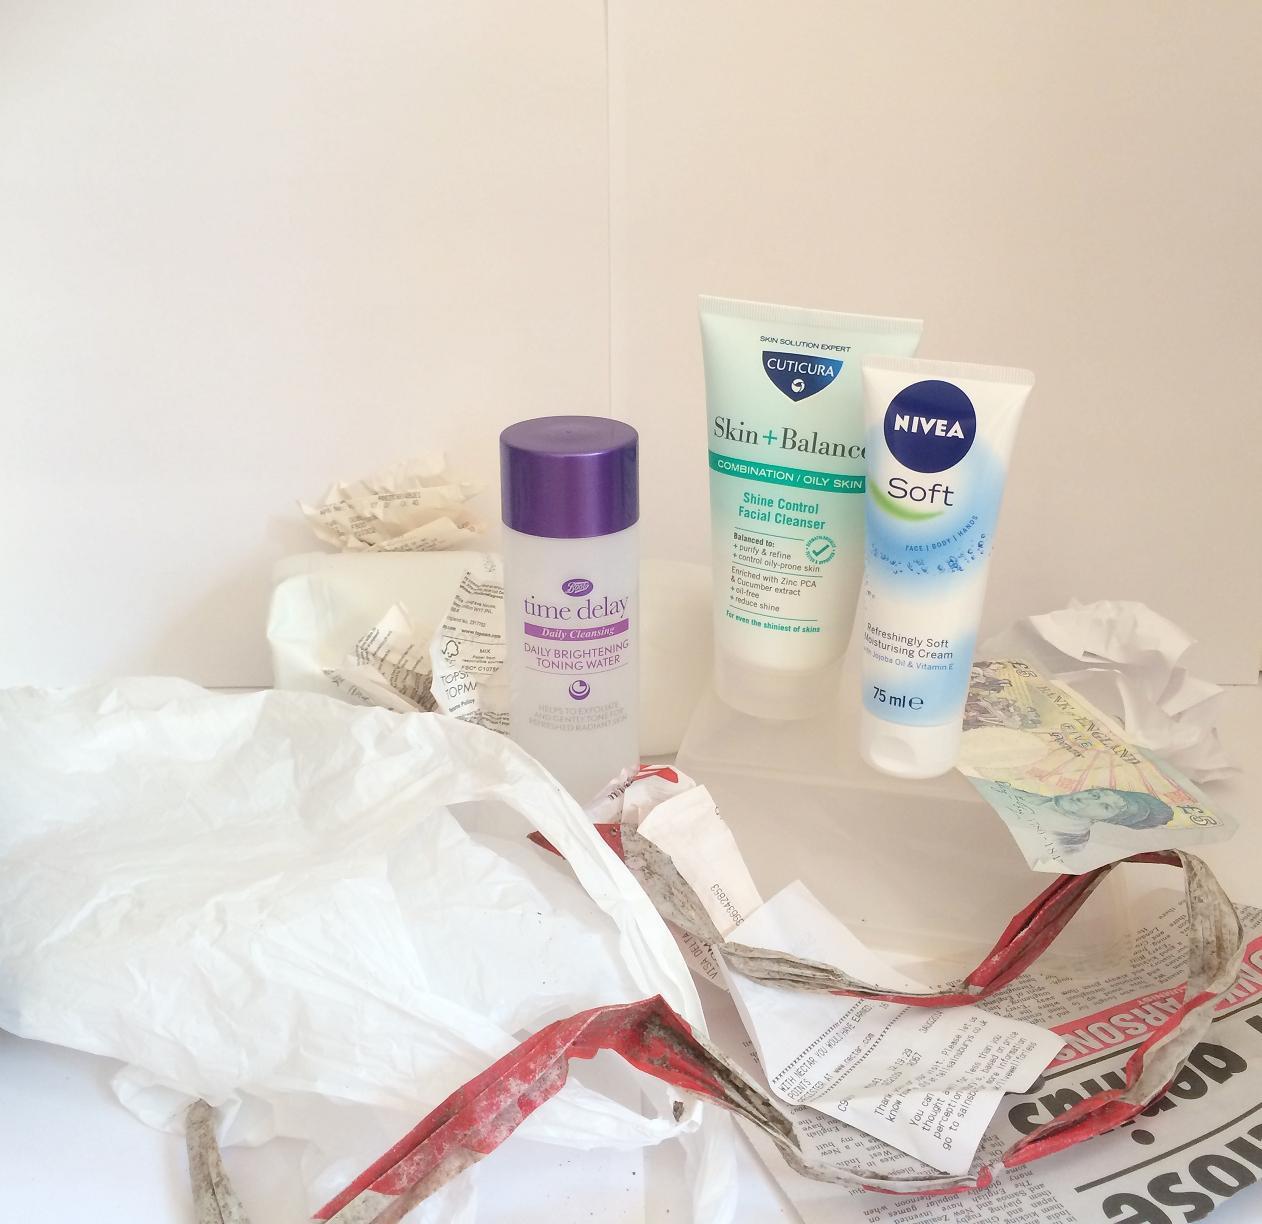 £5 skincare routine